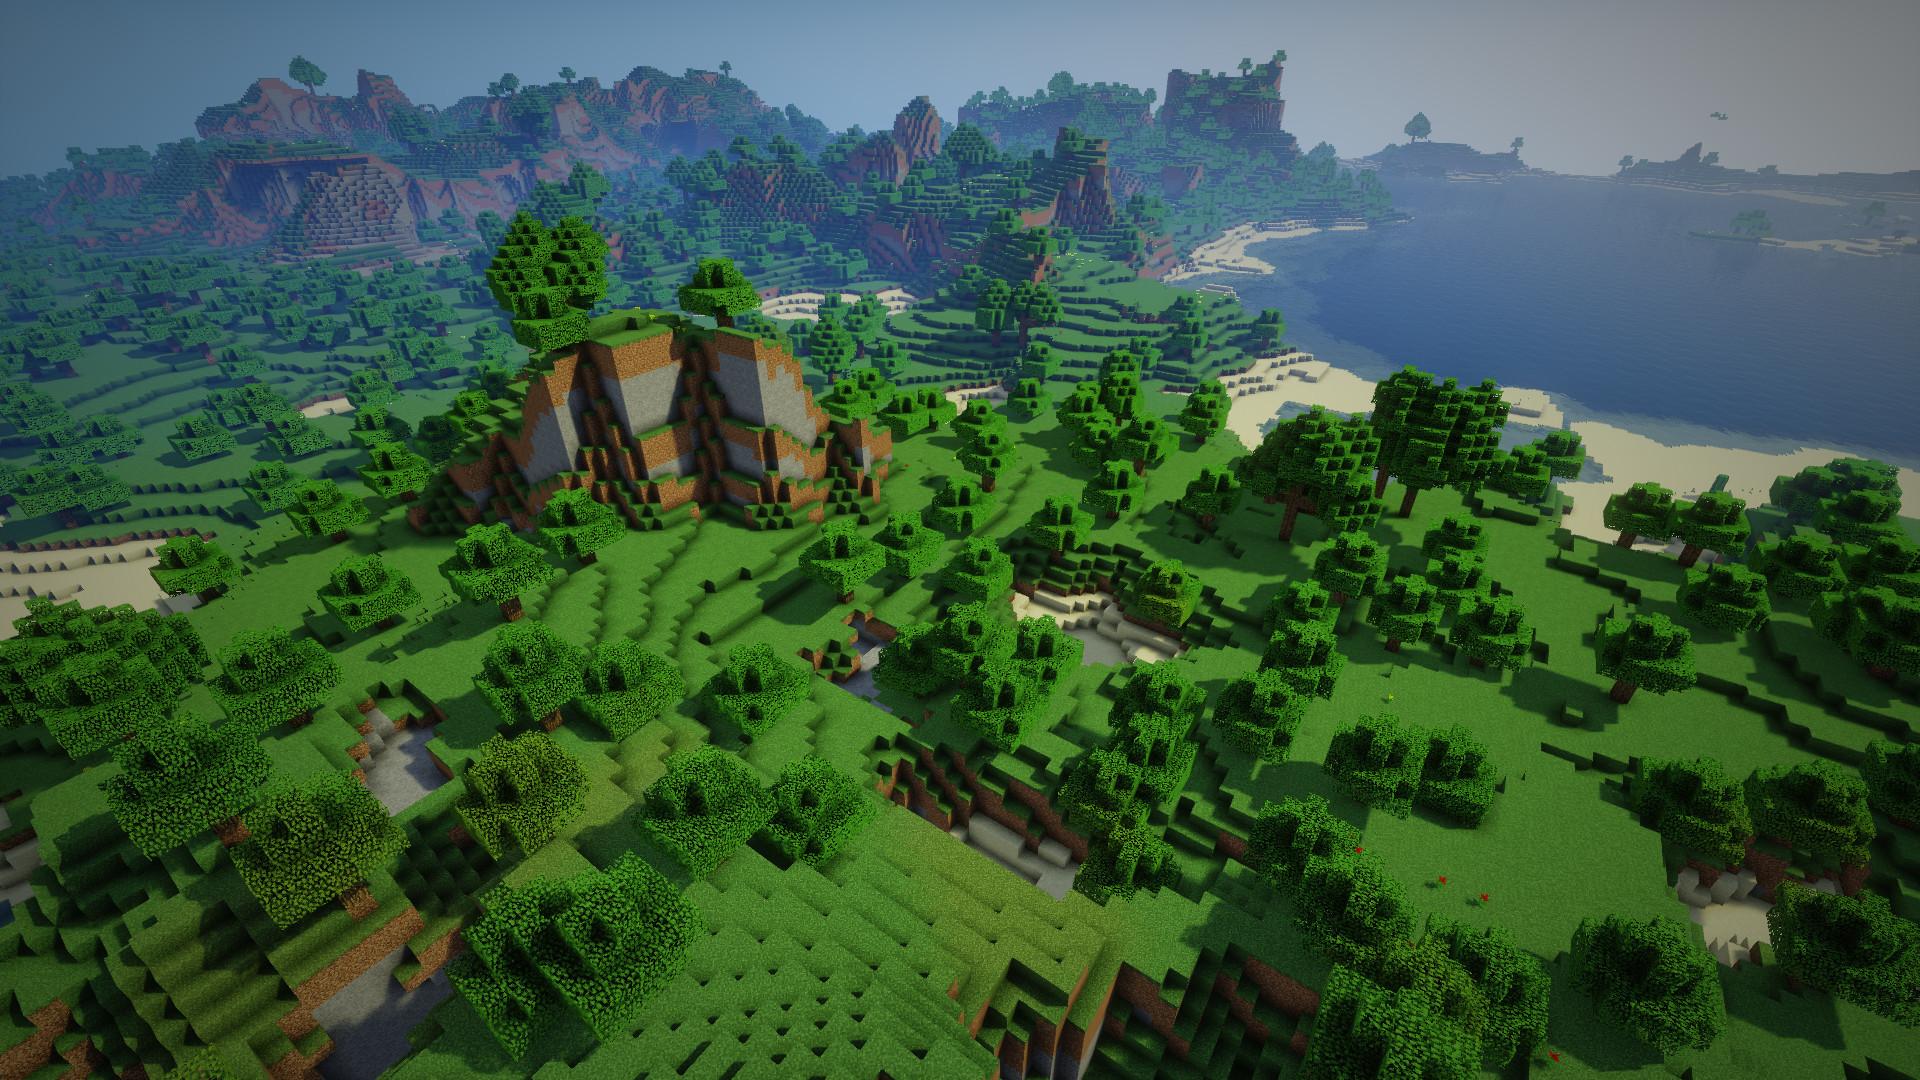 minecraft custom world generator mod